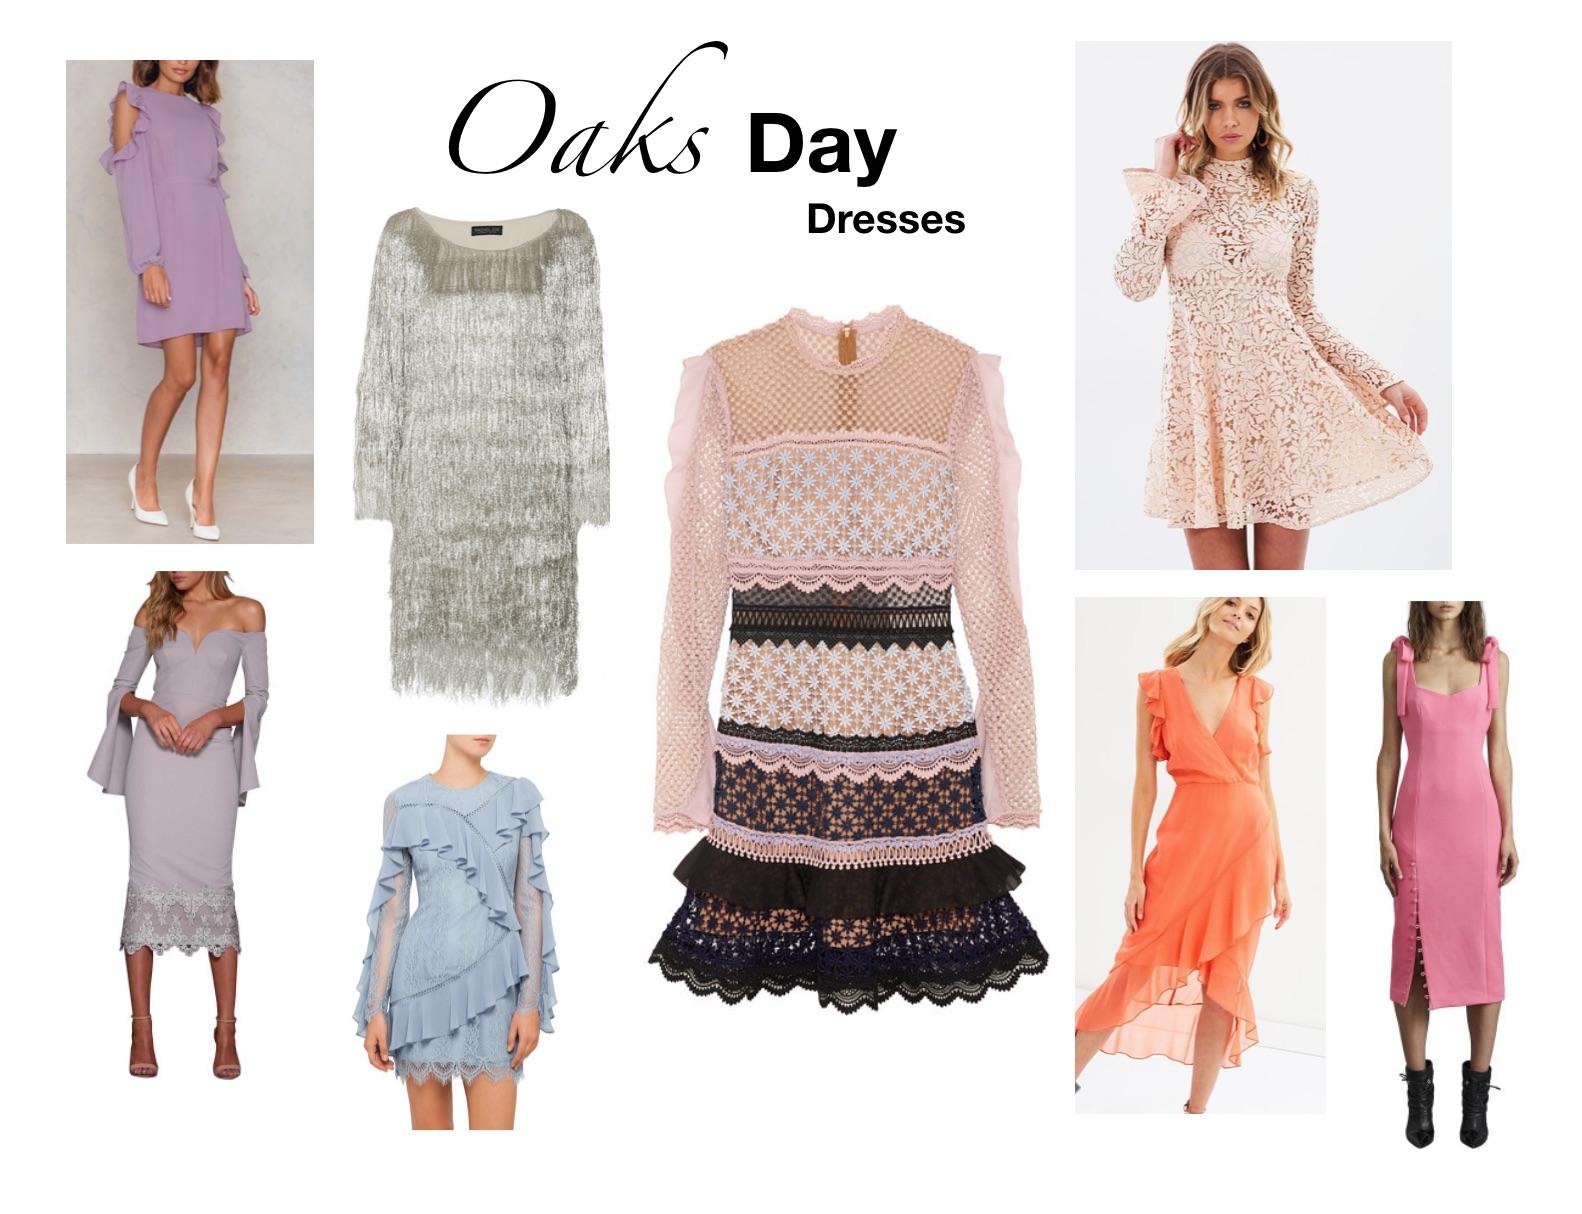 Oaks day fashion 2018 16